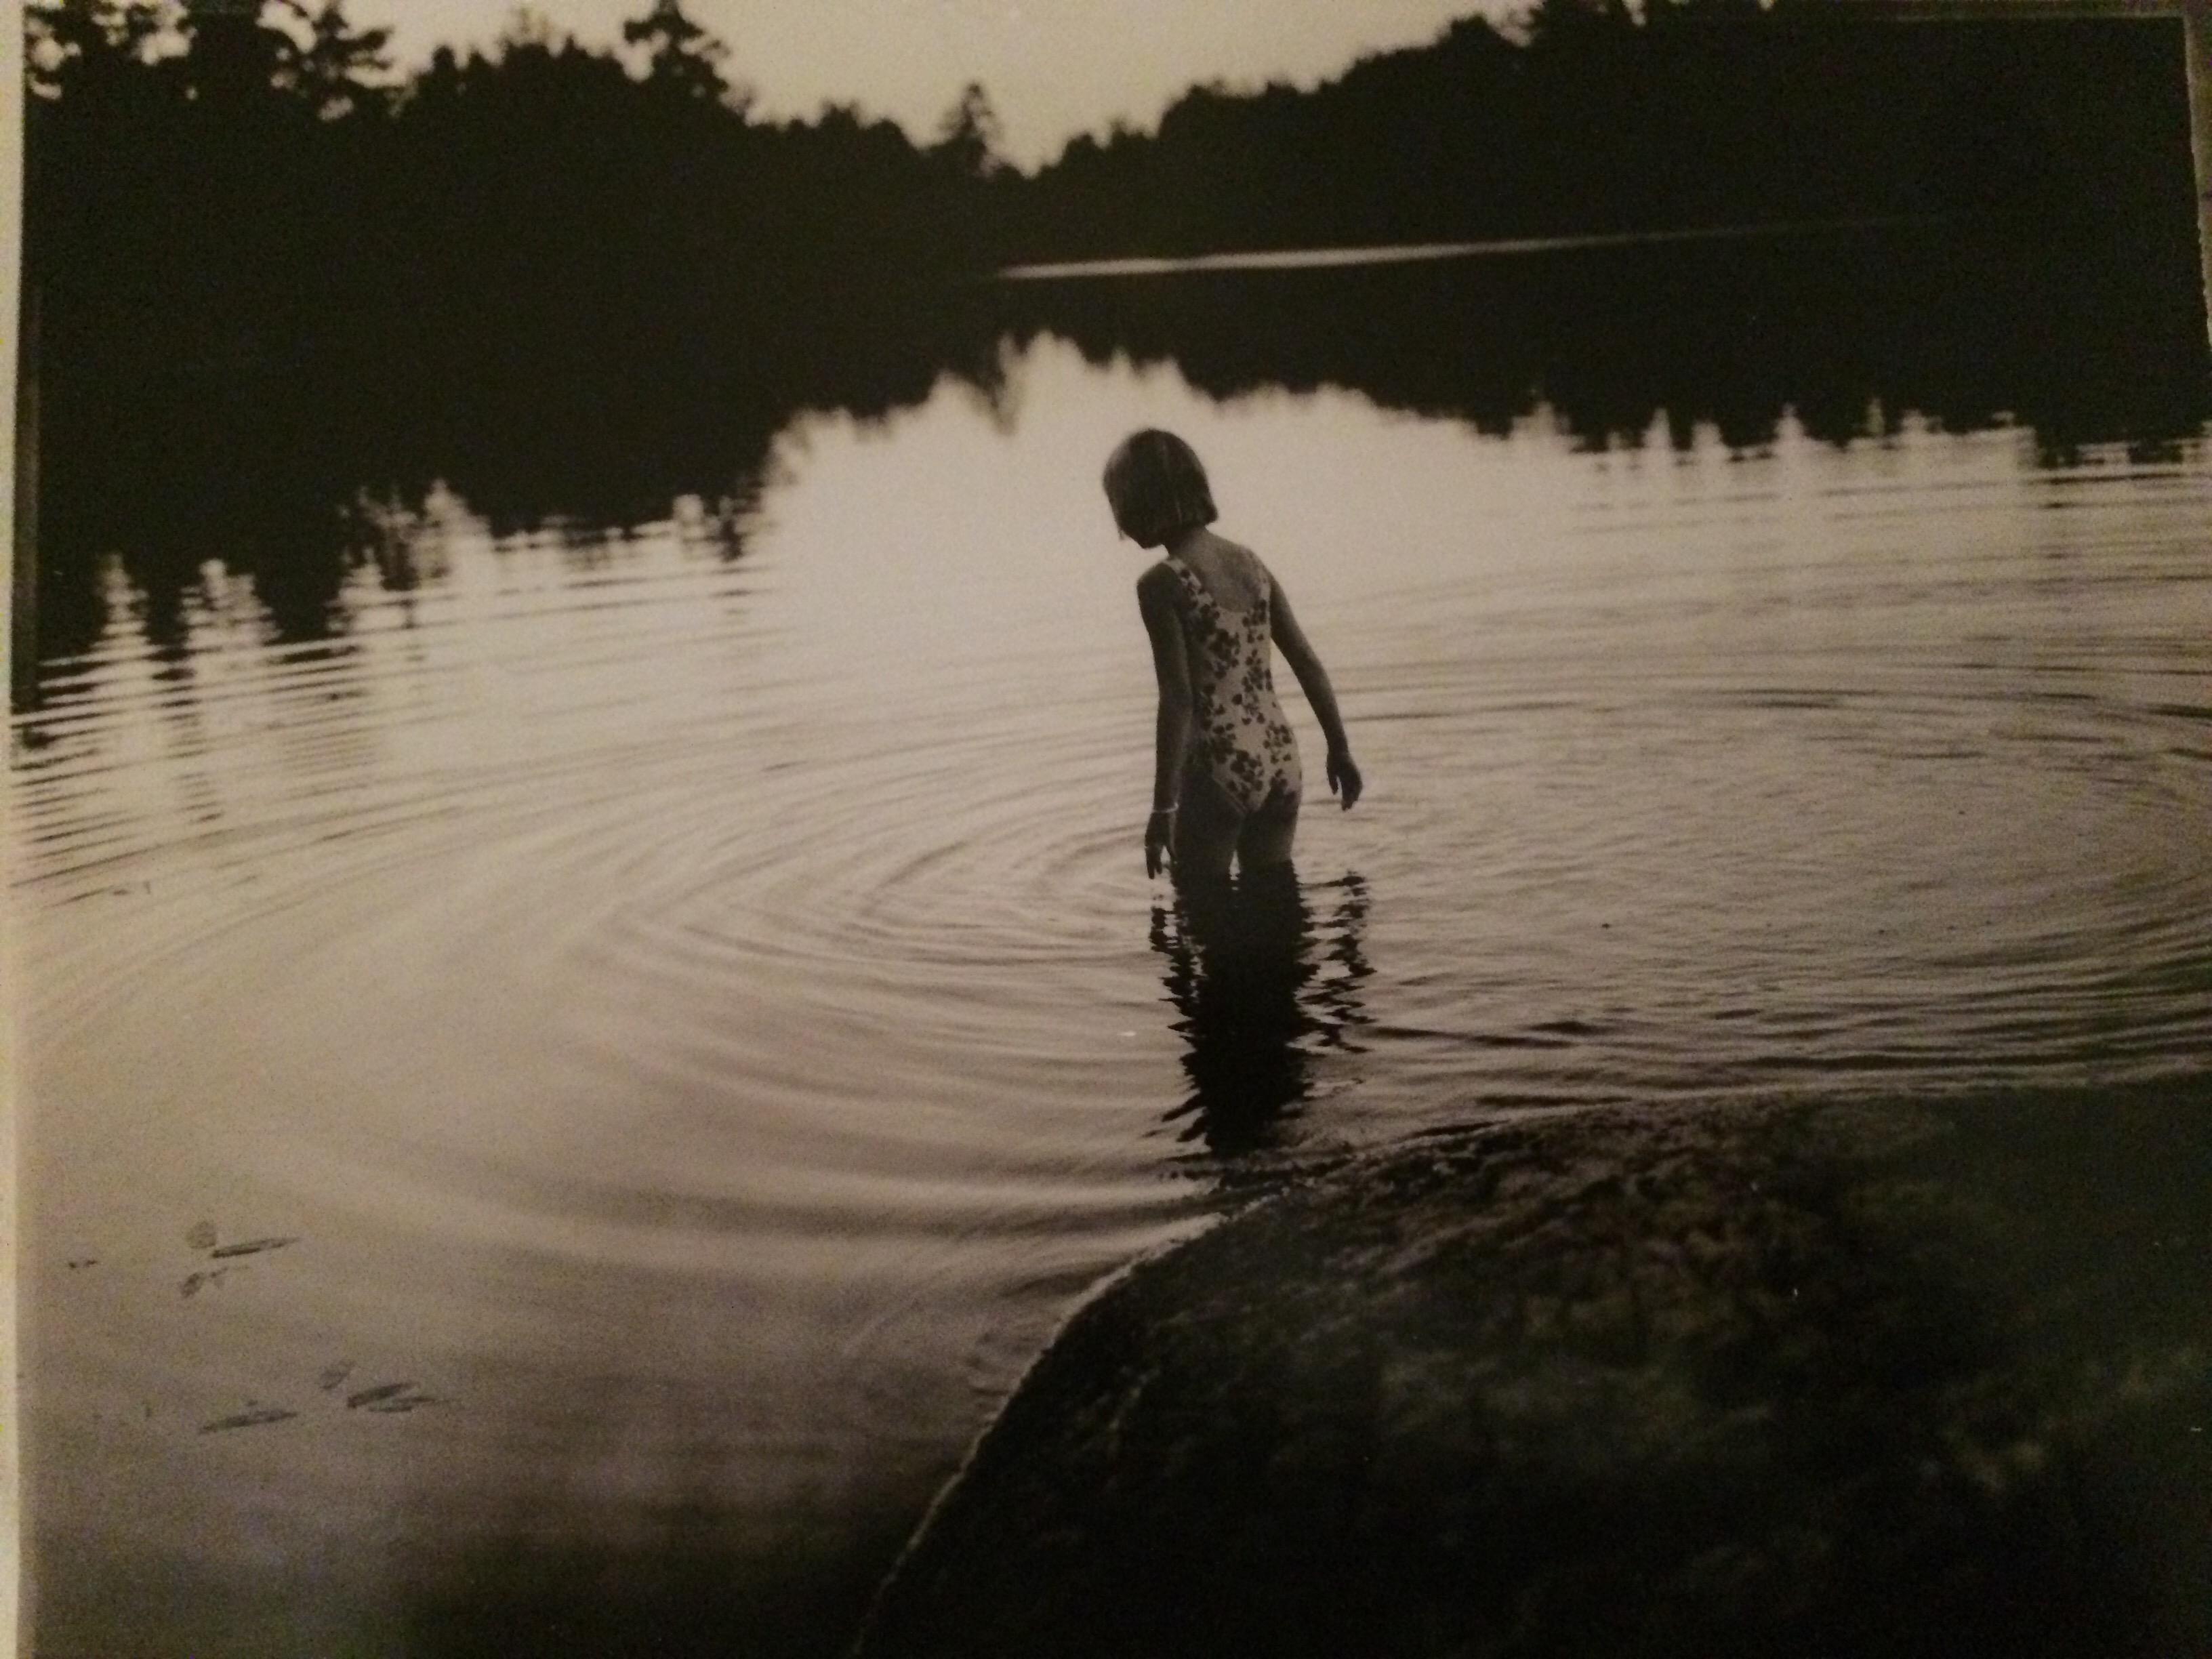 ©  Cato Lein Titel: Northern Silence 3 BildmŒått: 32x25 cm Teknik: Baryt, Lithprint Montering: Säljs oinramad Upplaga 3 +1AP Signerad: Ja   Pris: SEK 8500